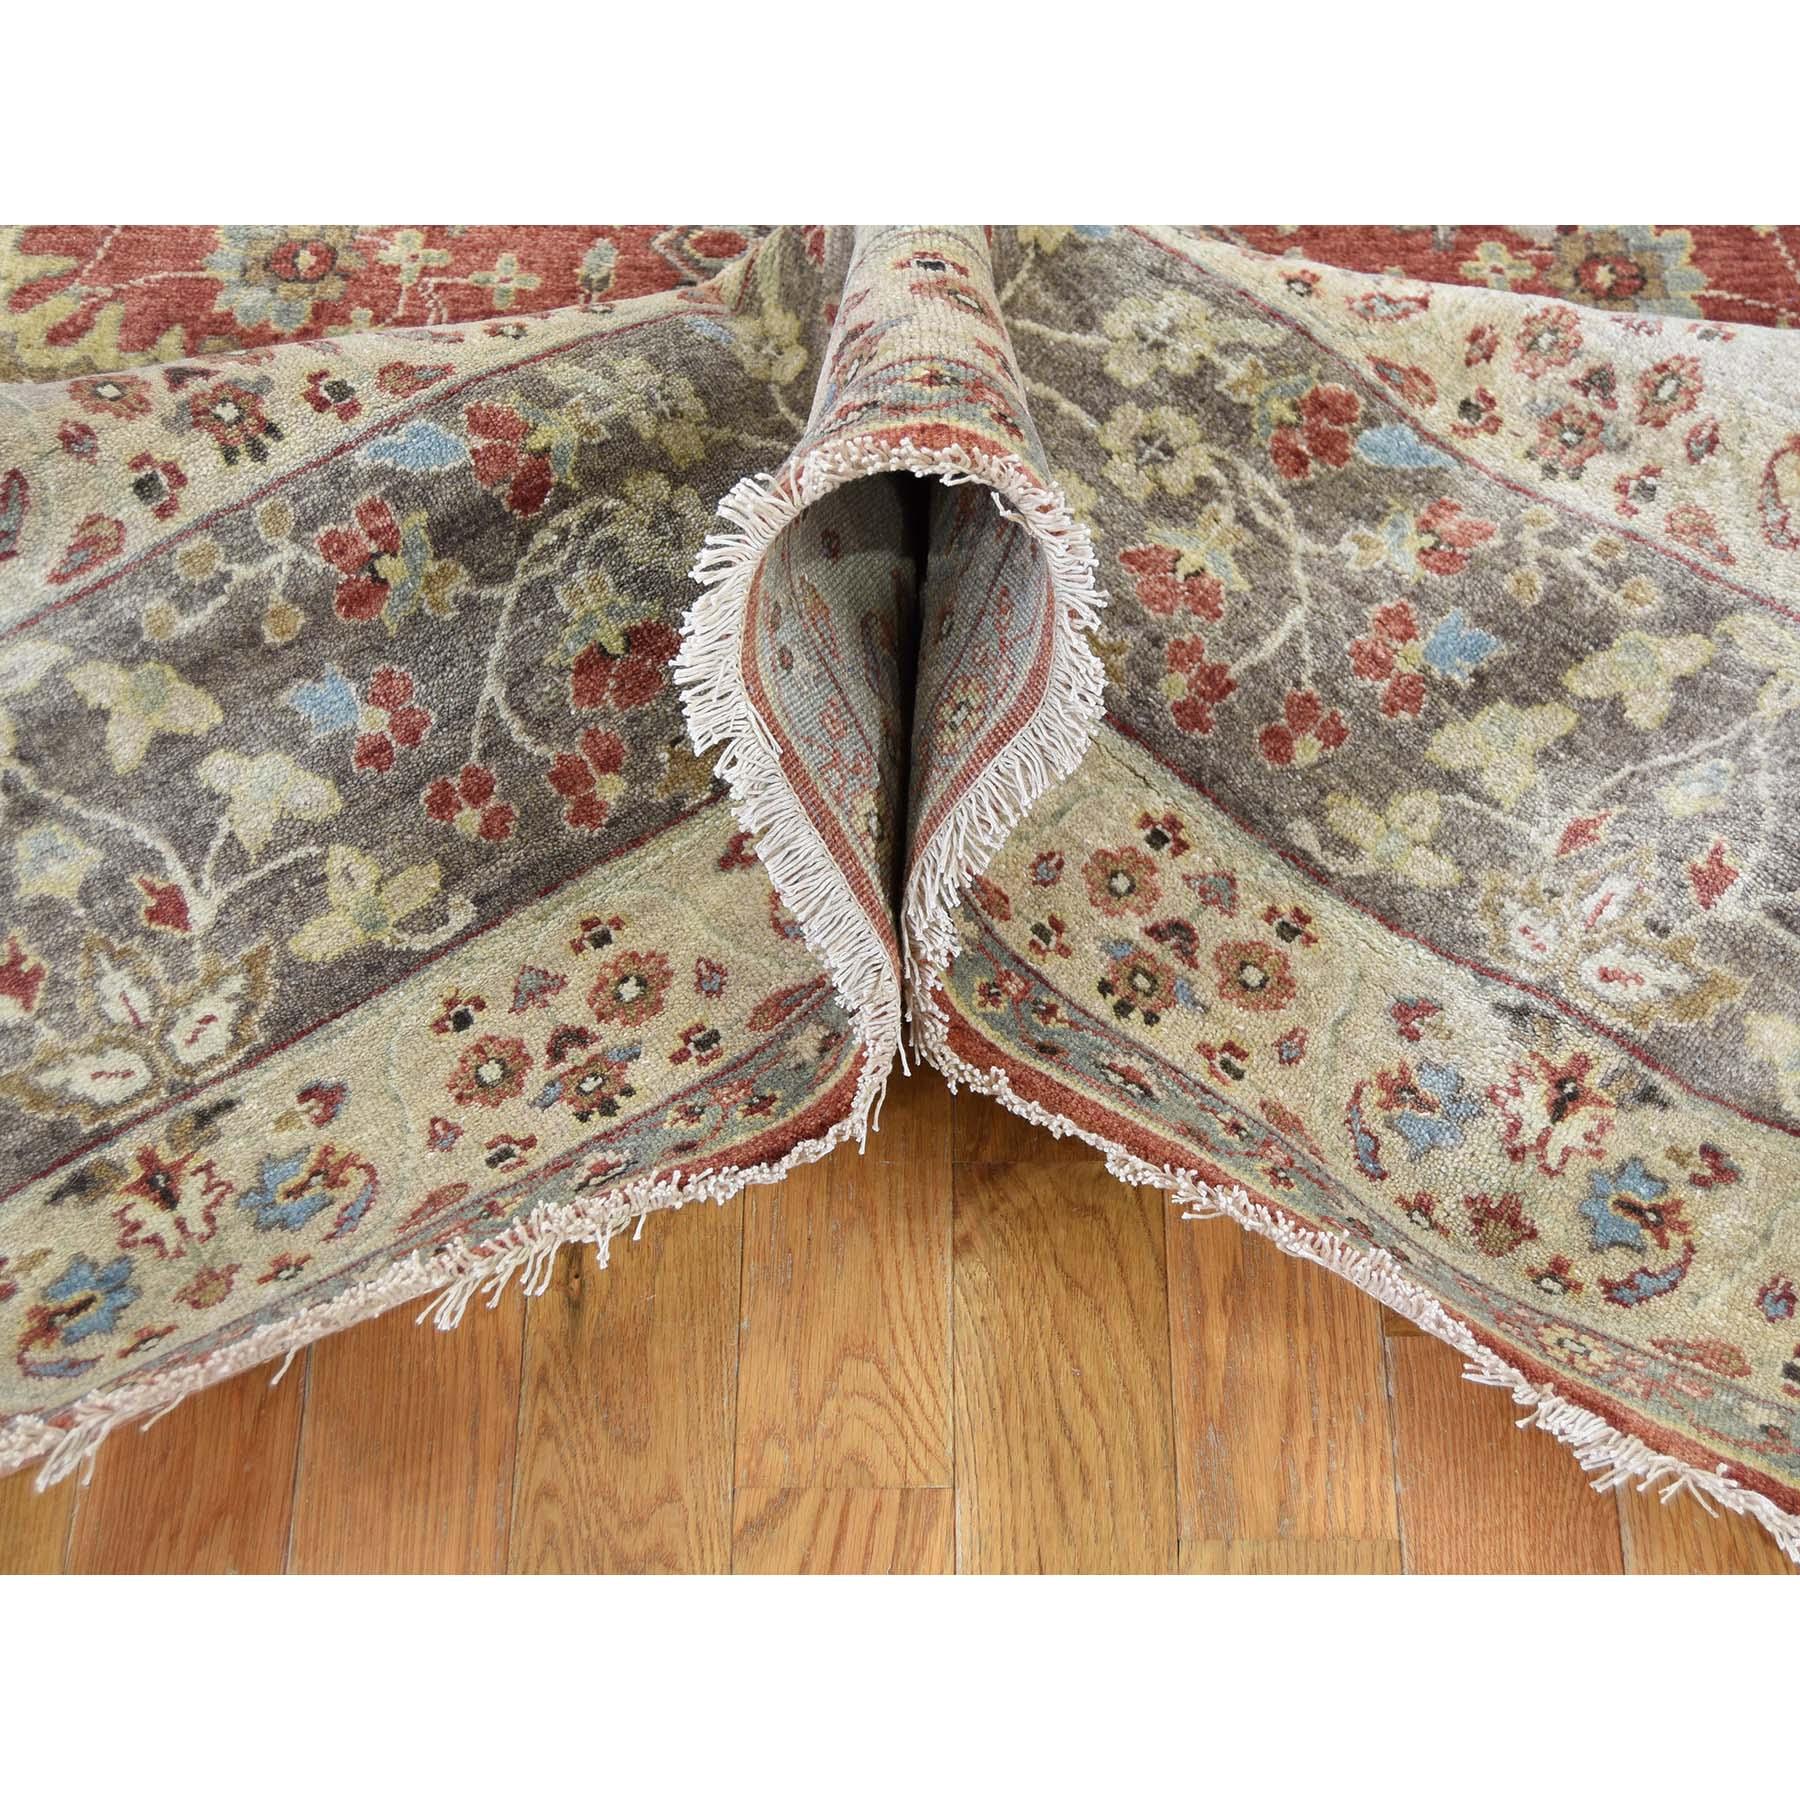 "9'2""x12' Hand-Knotted Antiqued Haji Jalili Tabriz Re-creation Pure Wool Rug"